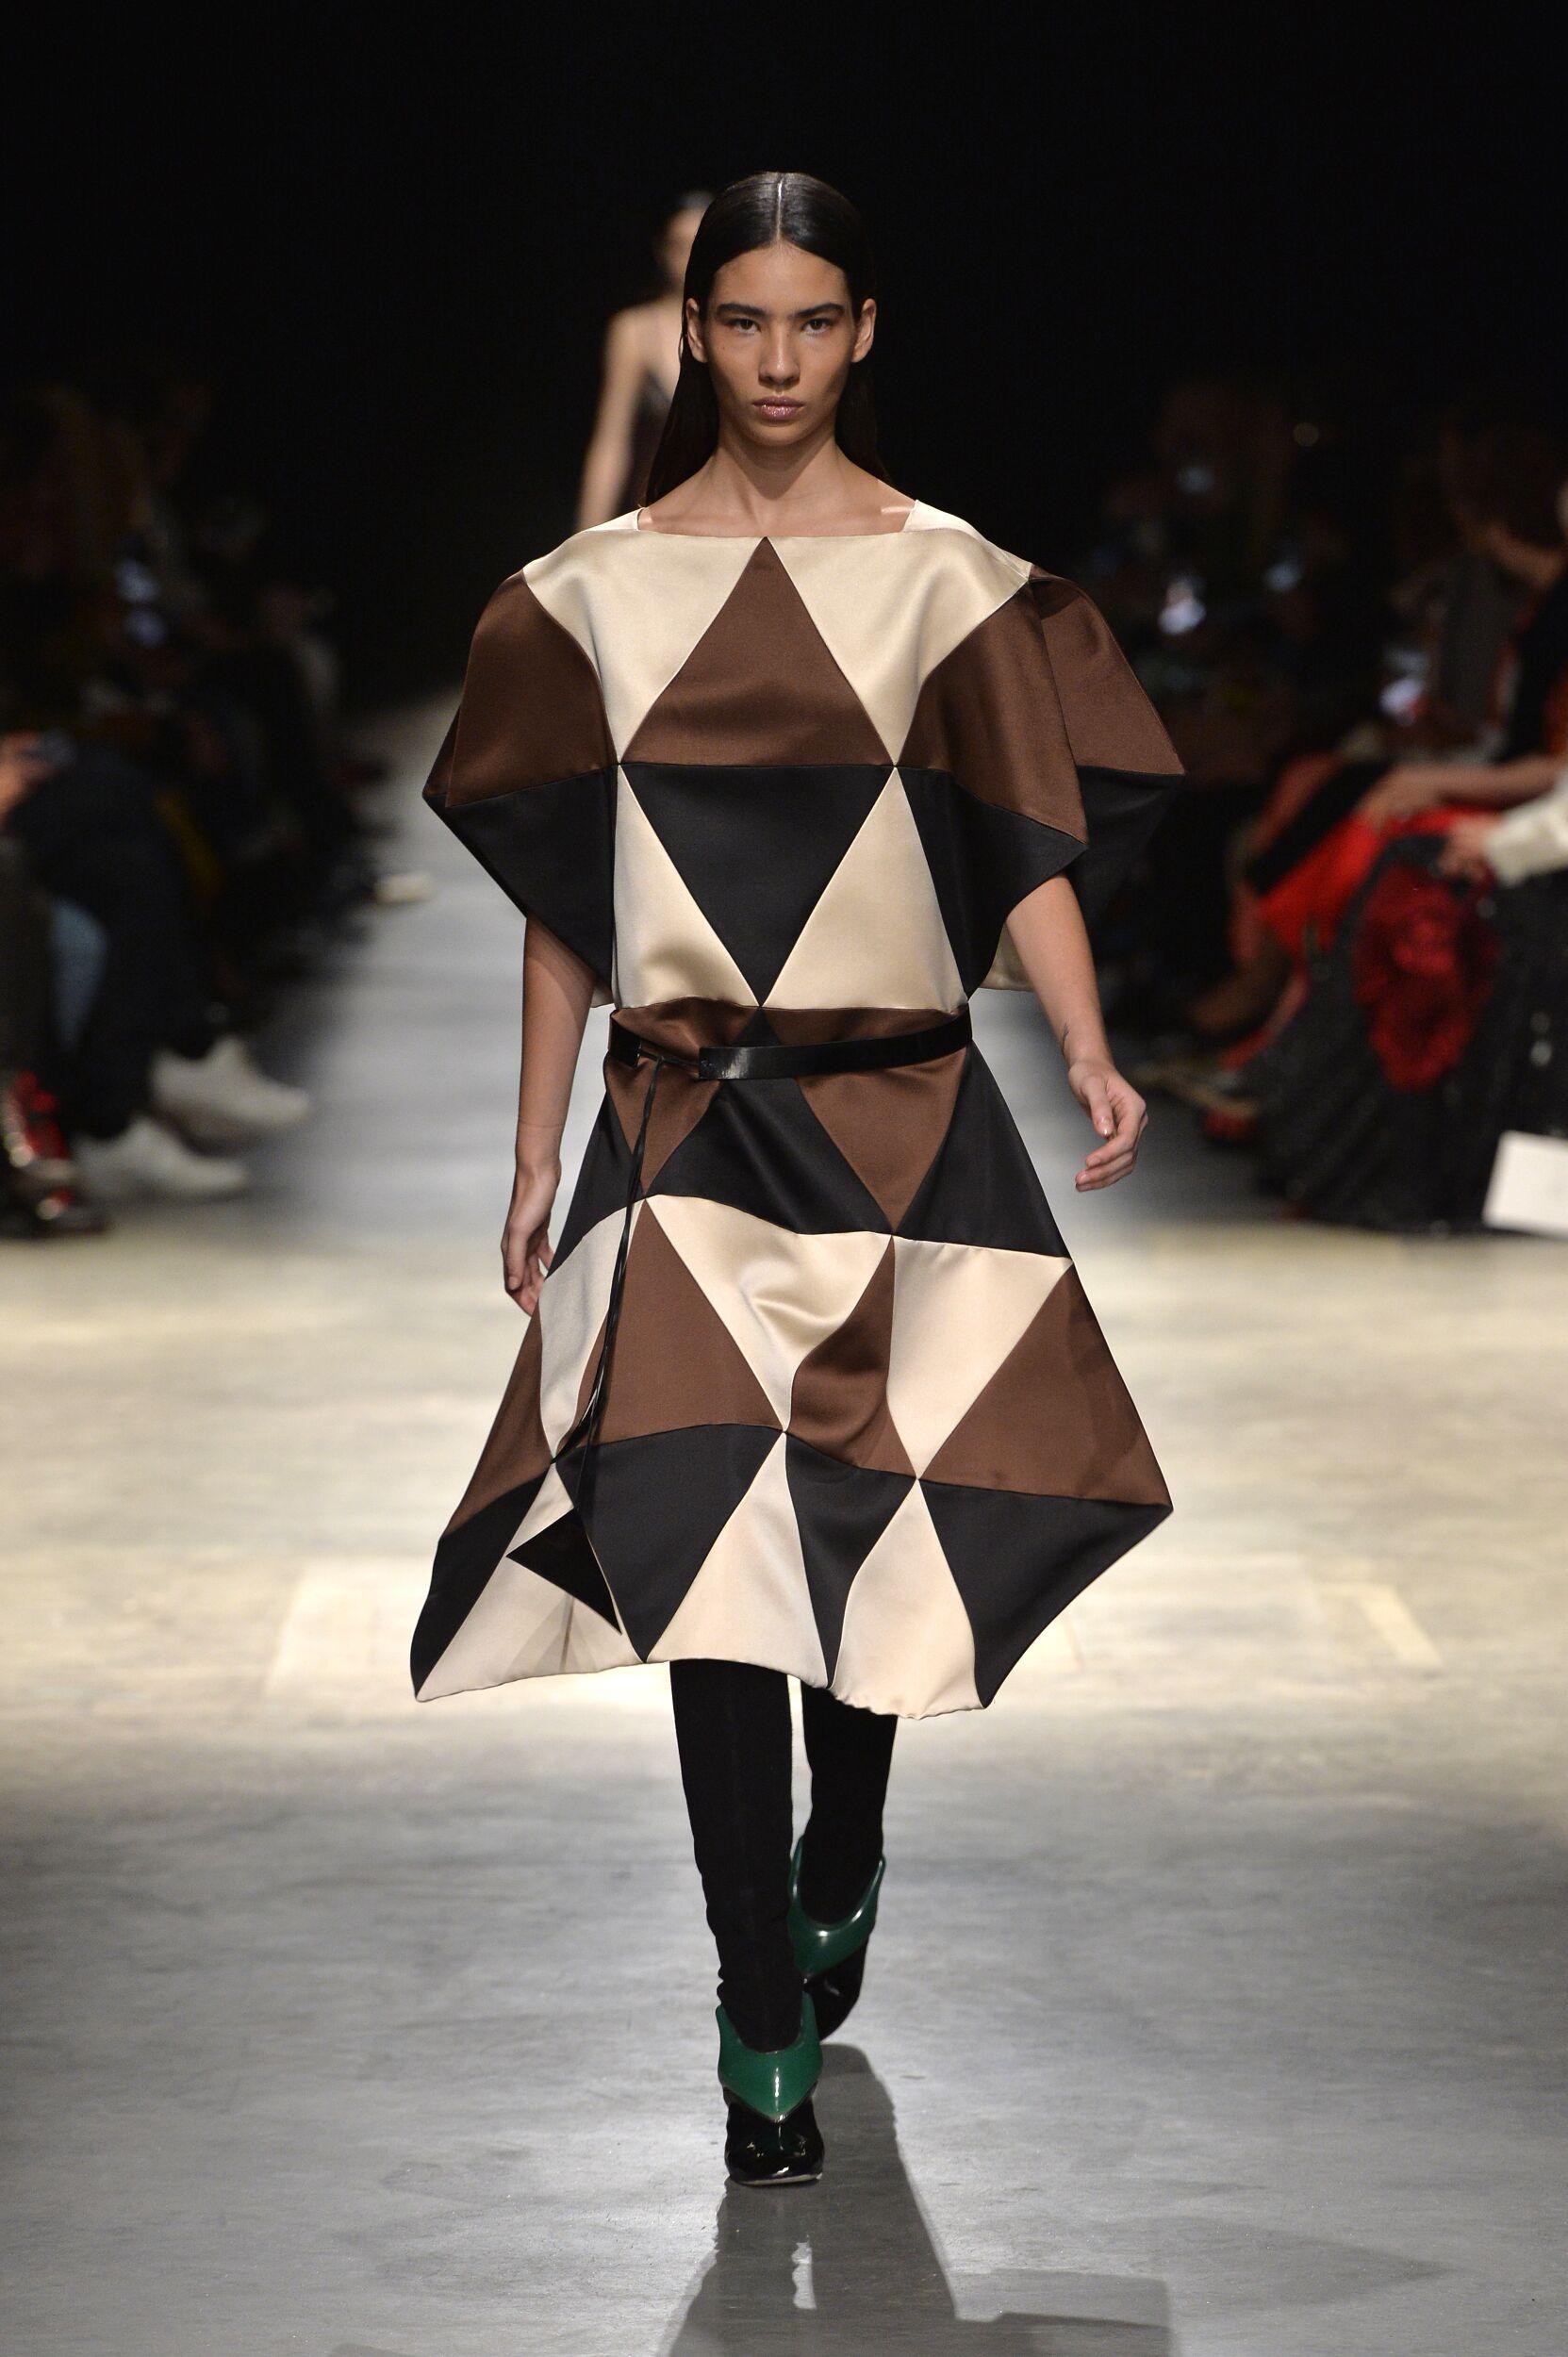 Model Fashion Show Christopher Kane